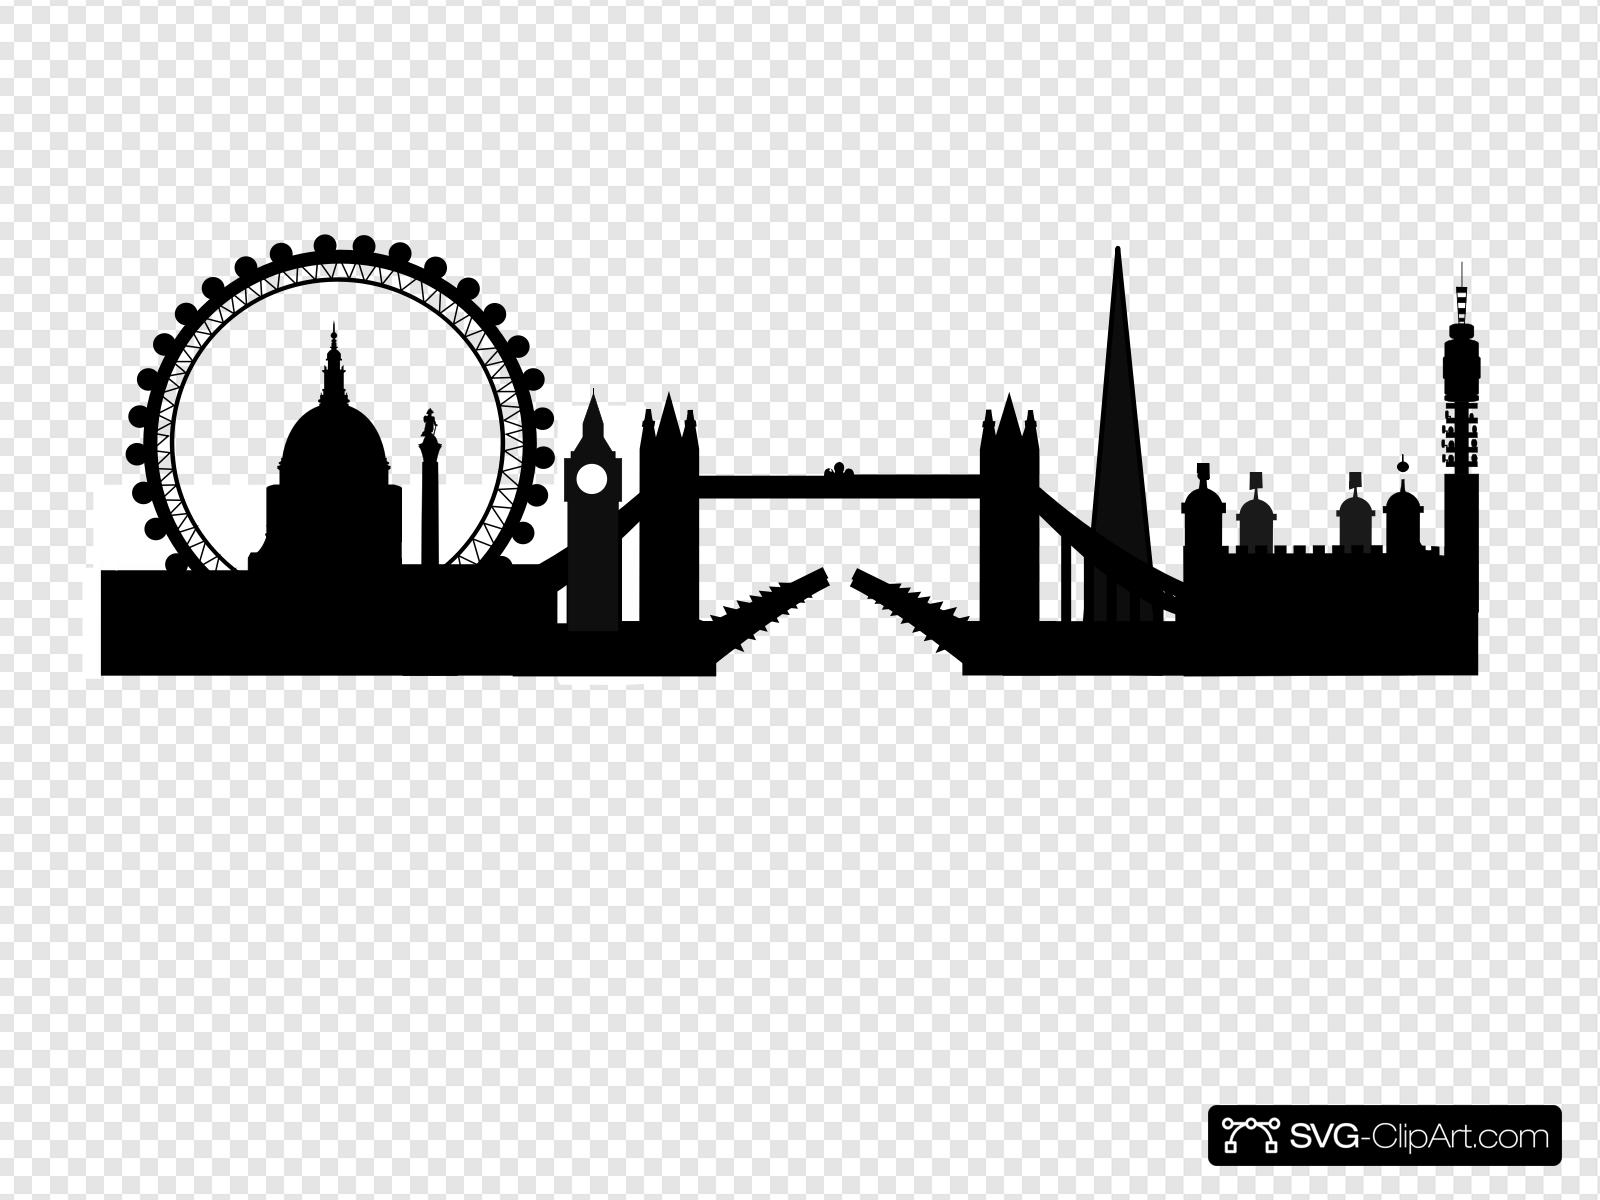 Skyline clipart skyline london, Skyline skyline london